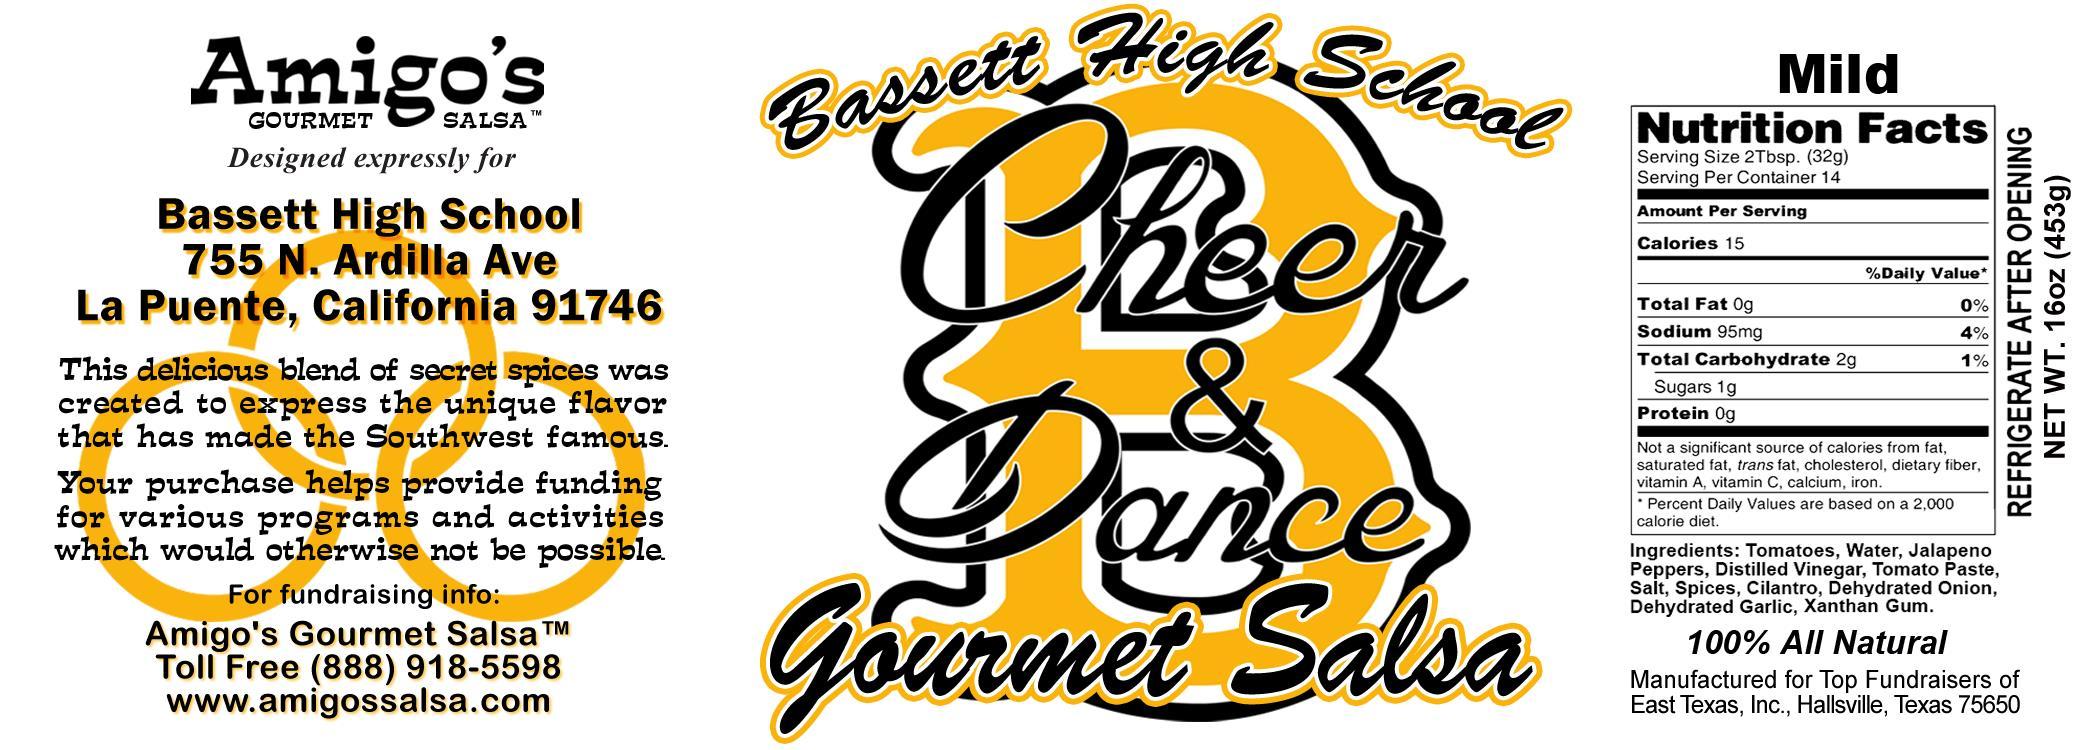 Bassett High School MILD.jpg